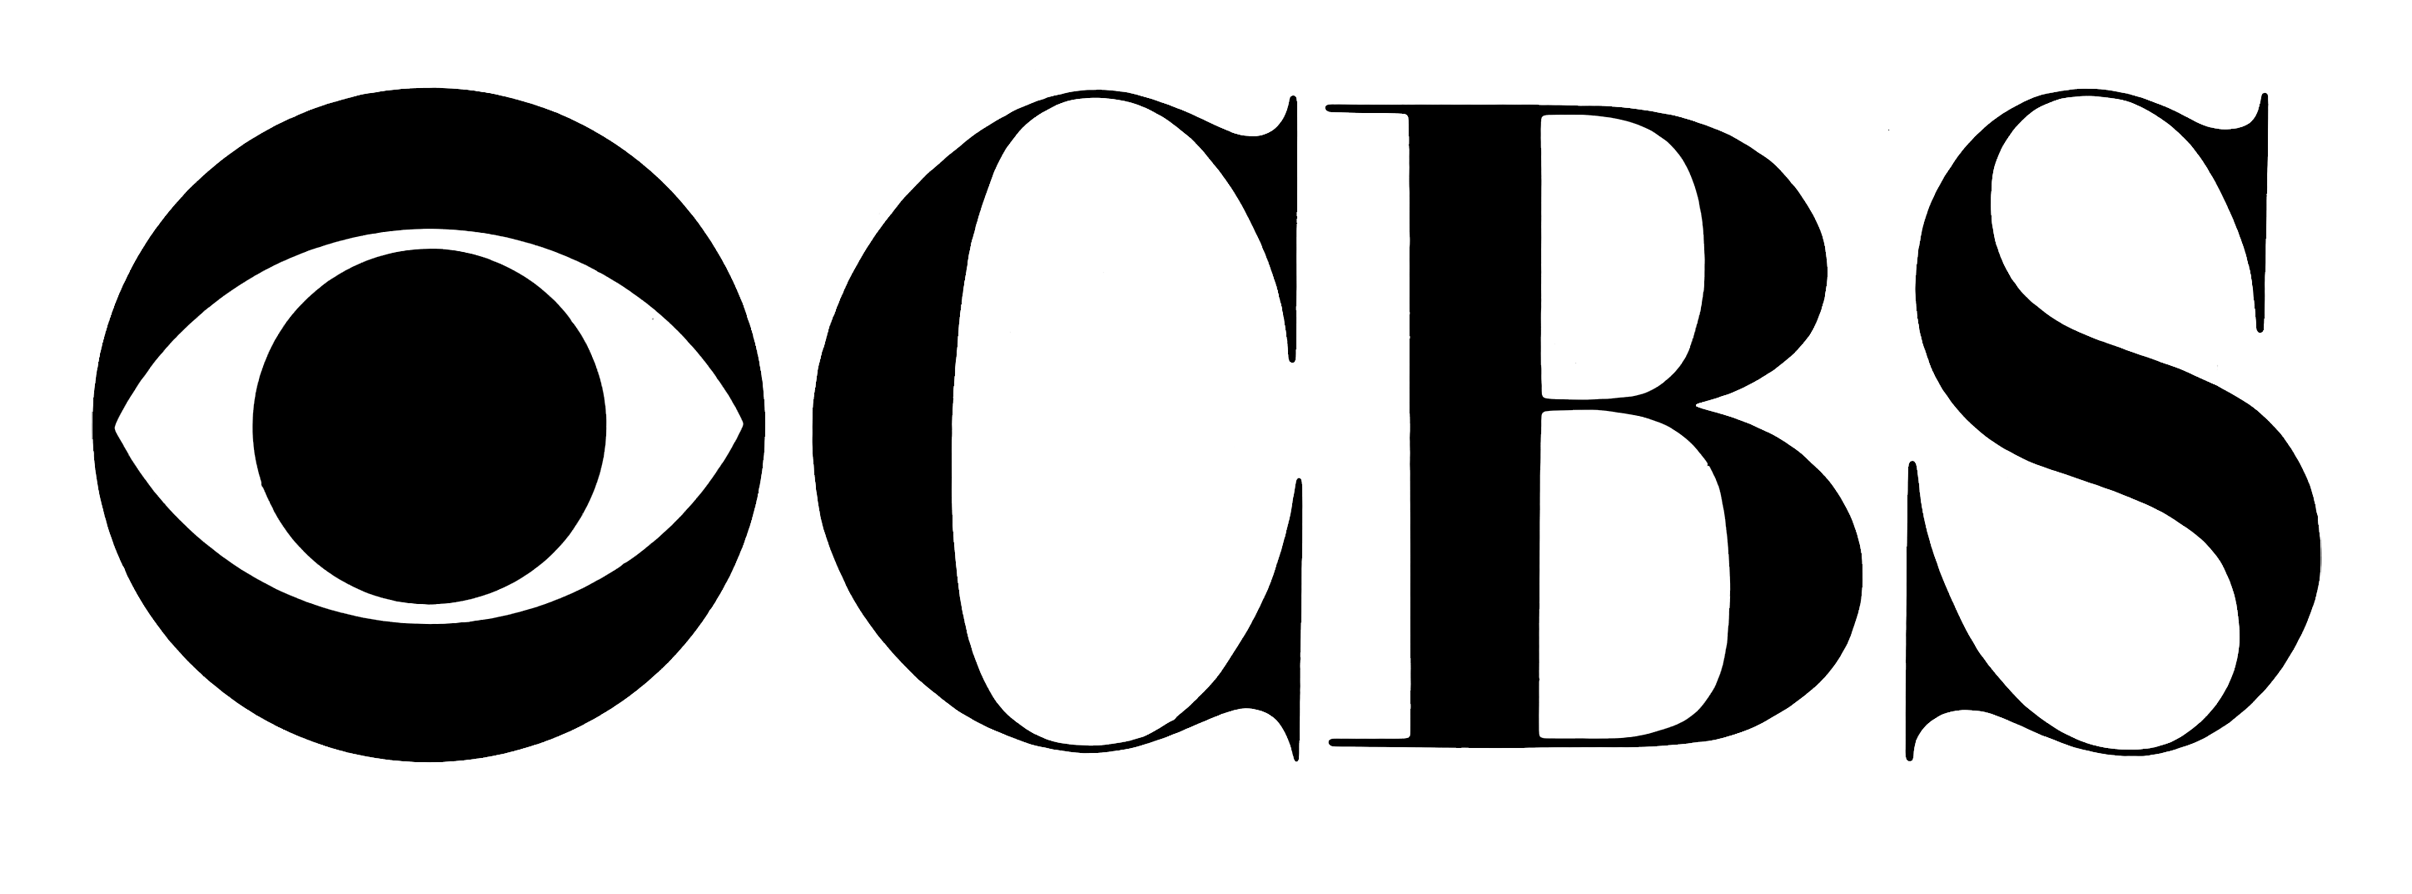 CBS Logo PNG Image.